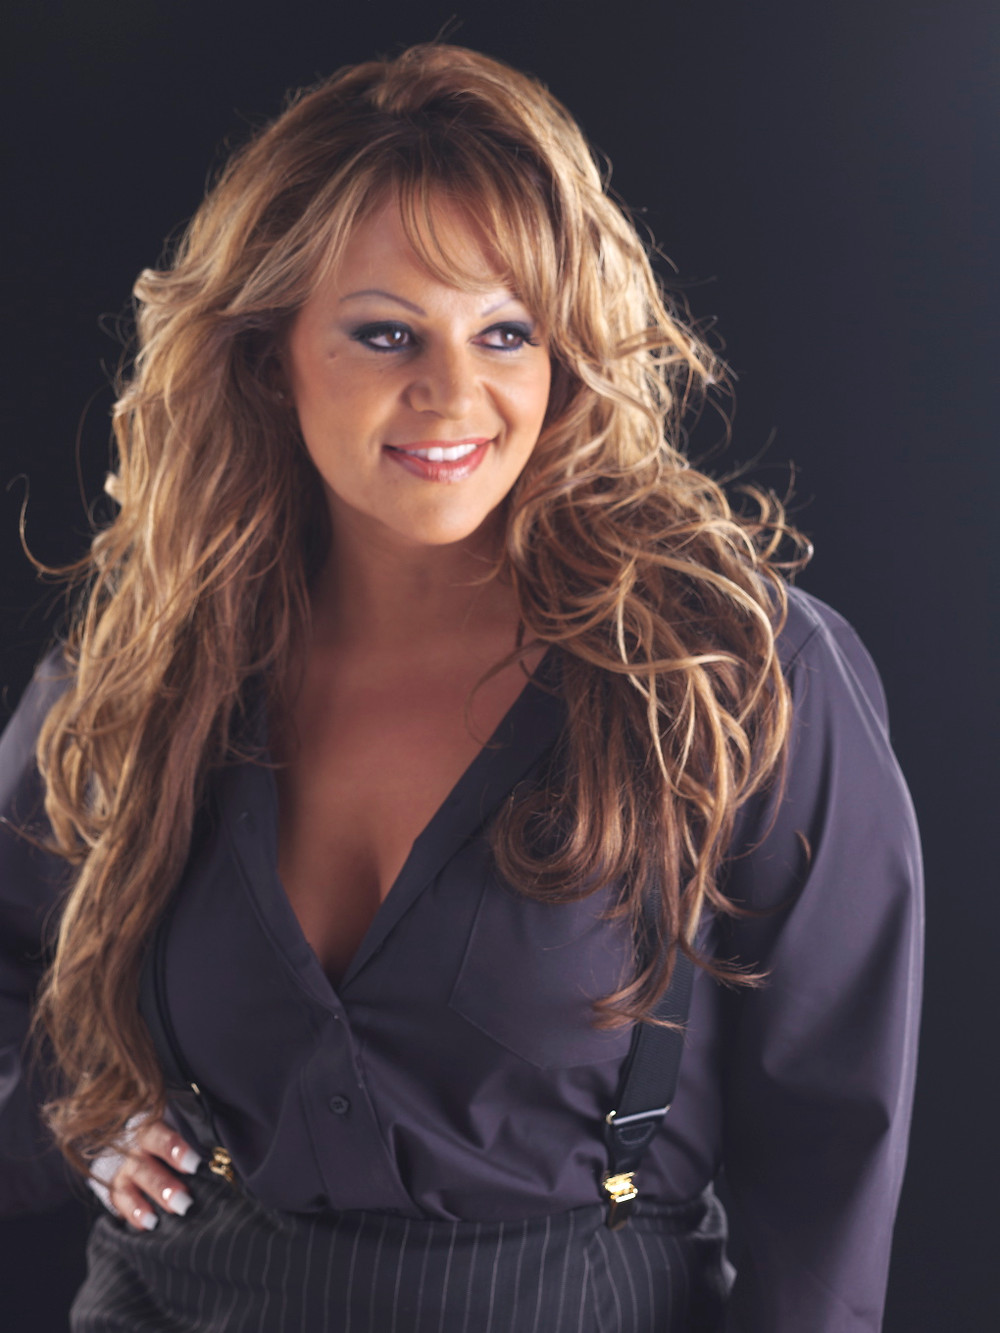 Aparentemente Bien Jenni Rivera Diva de la Banda